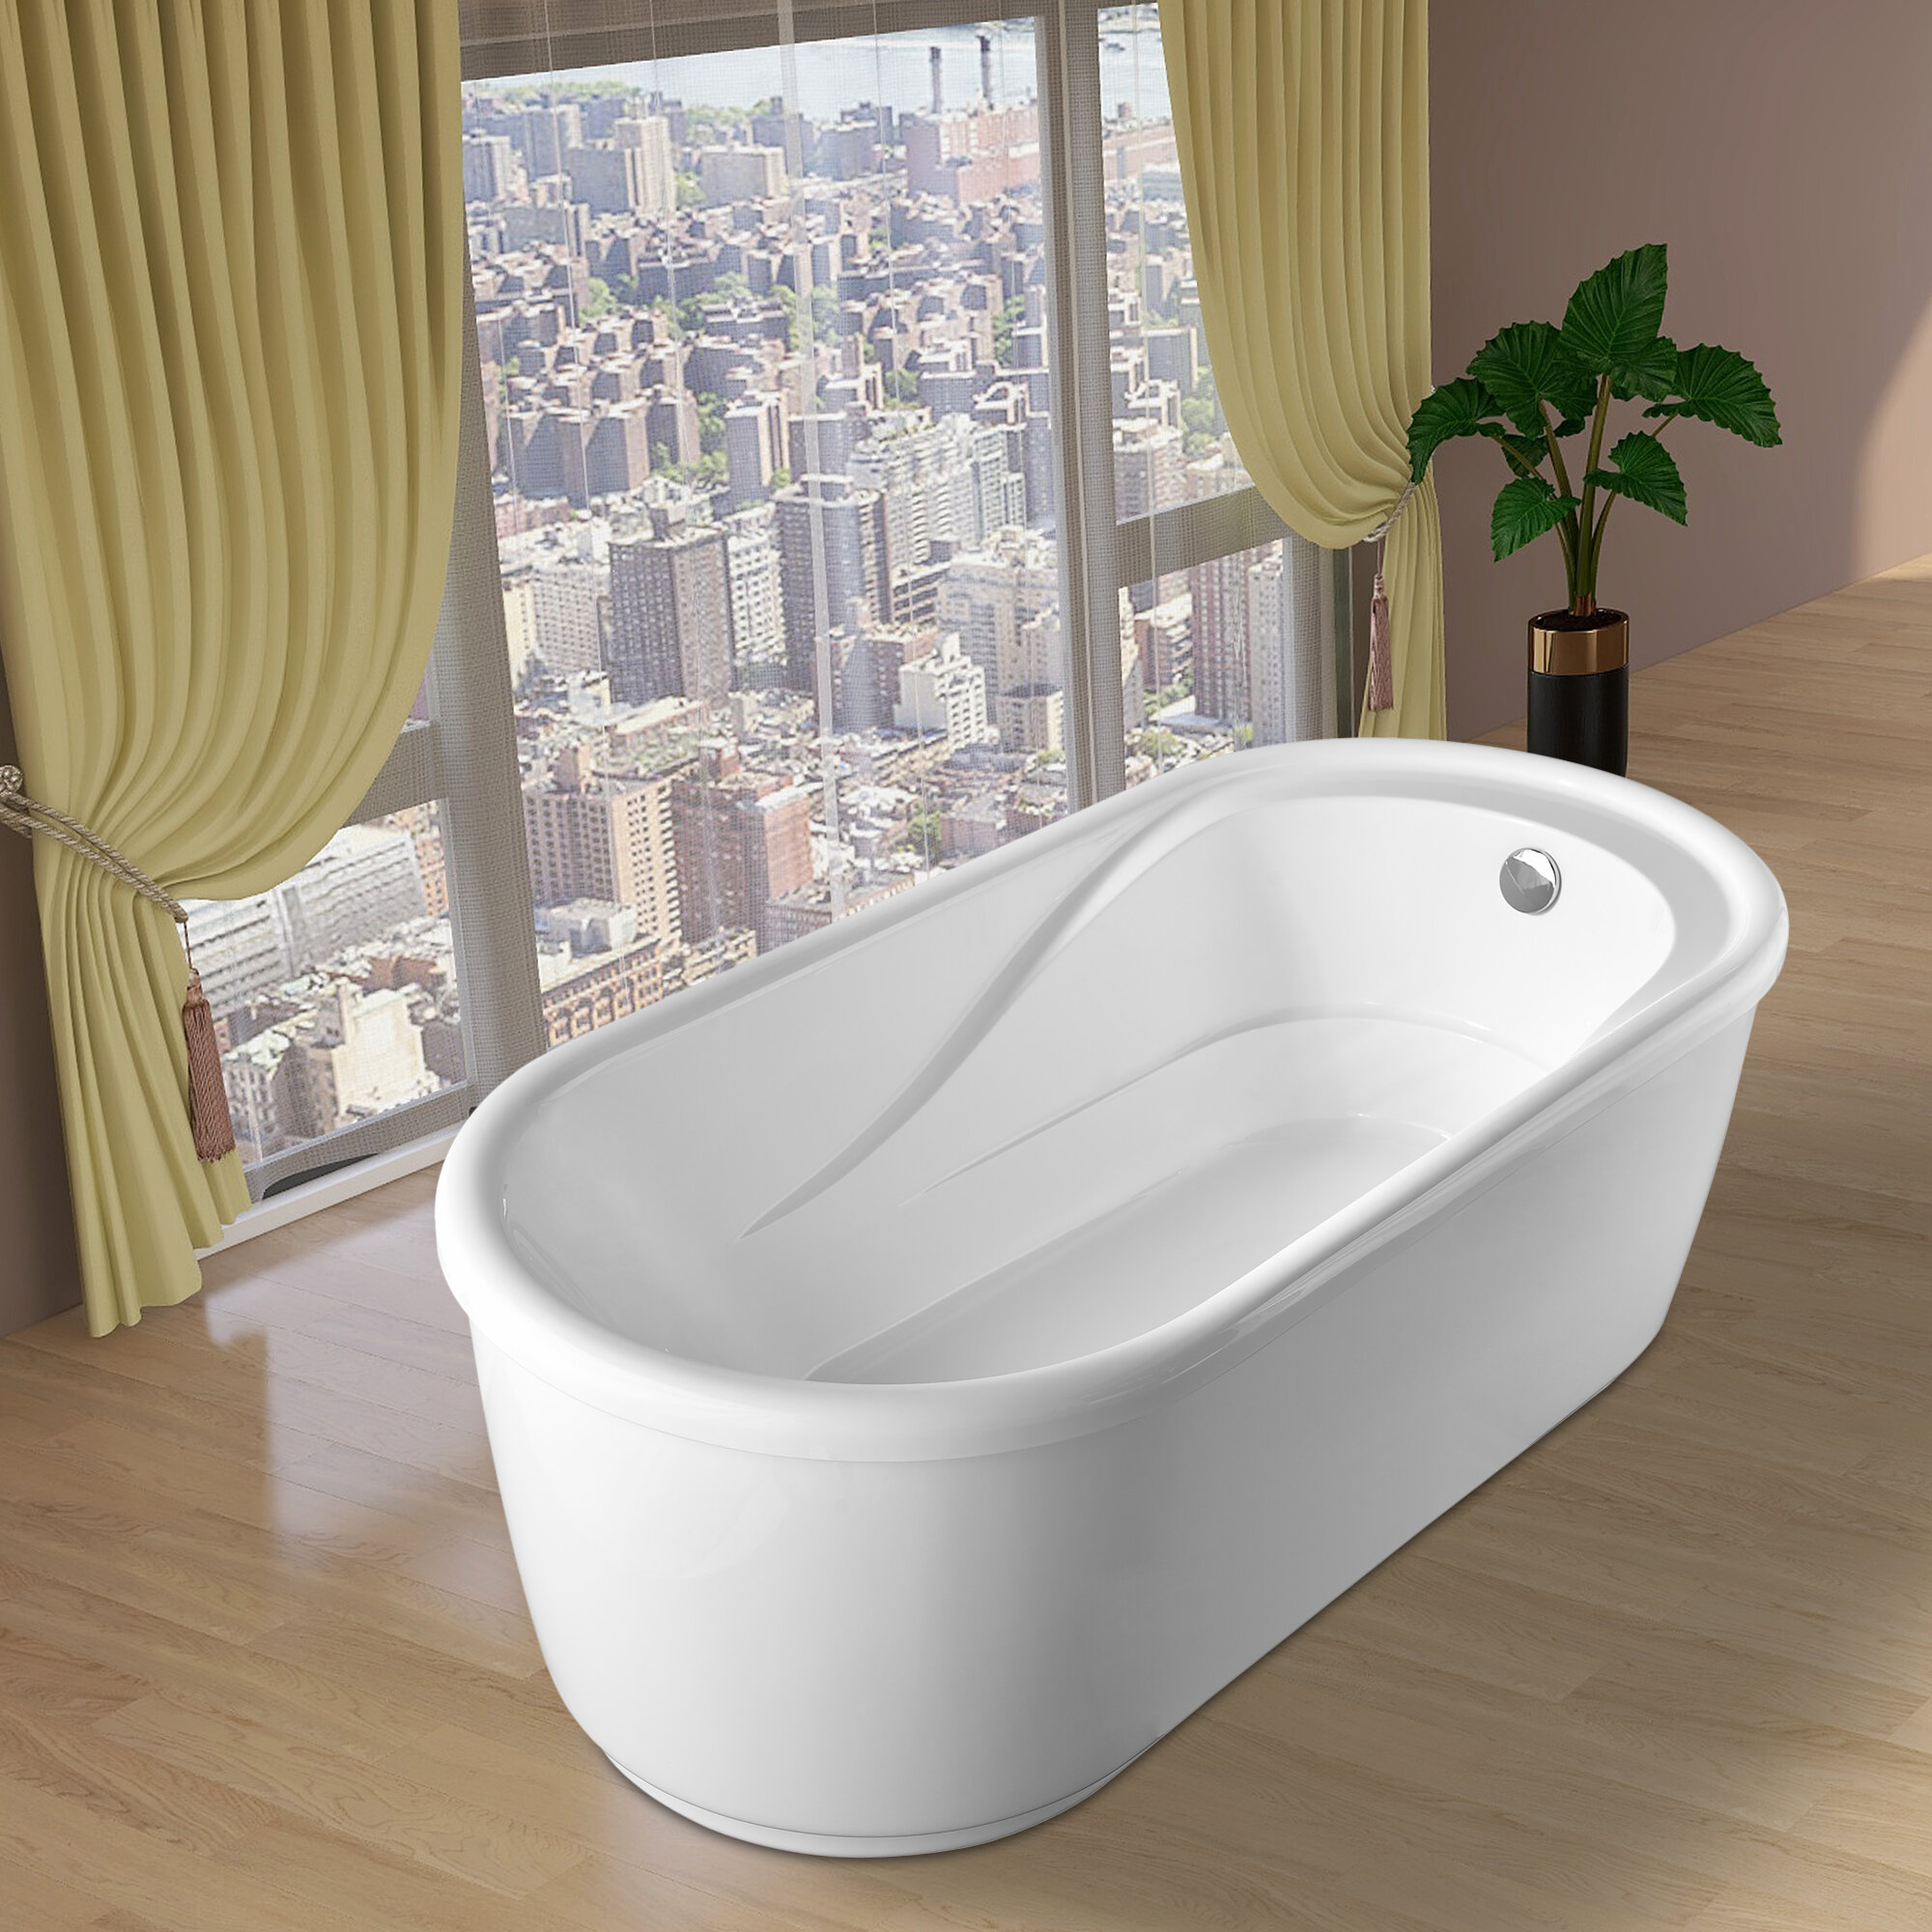 Vanity Art 67 X 32 Freestanding Soaking Bathtub Reviews Wayfair